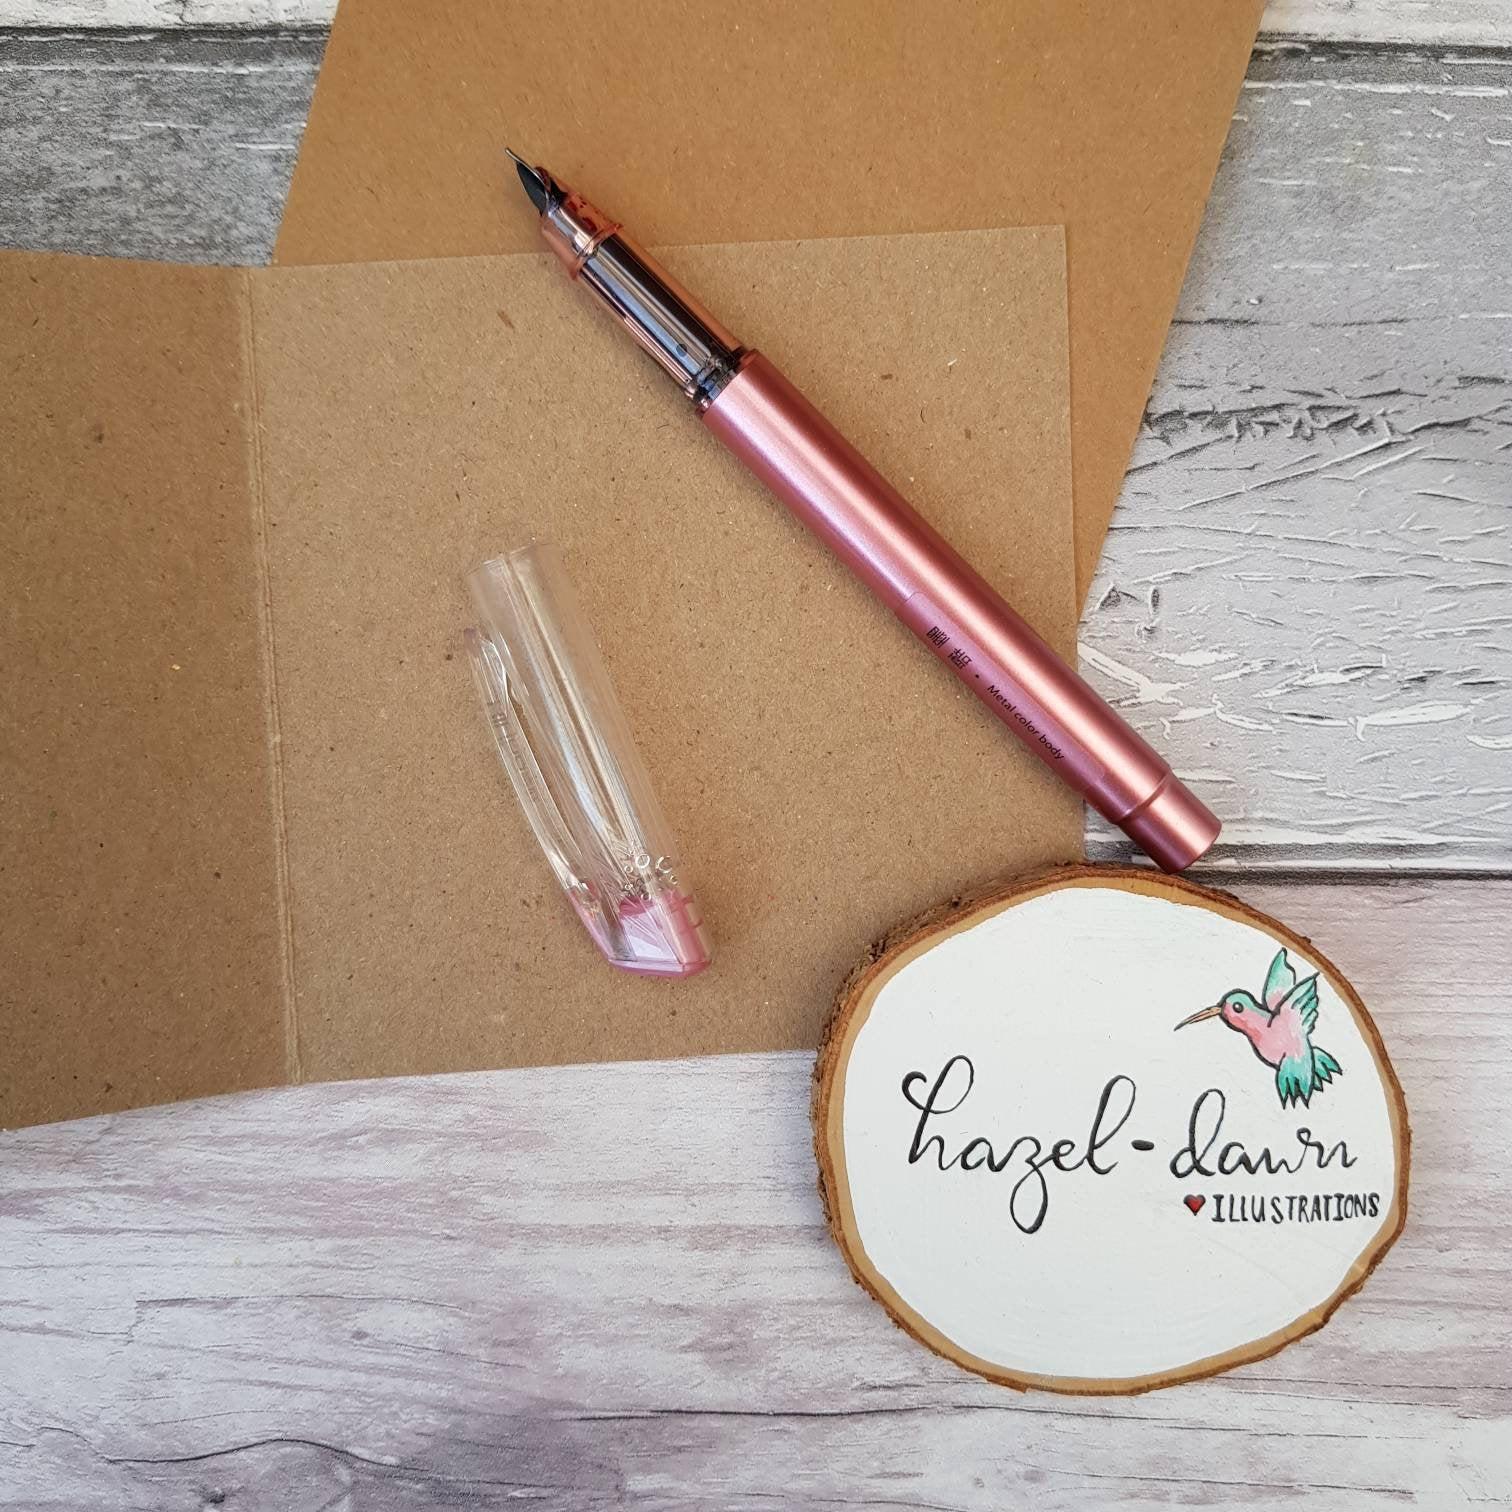 Sending Healing Vibes Card, Blank Card, Friendship, Motivation, Support – Handmade Kind Shop 2